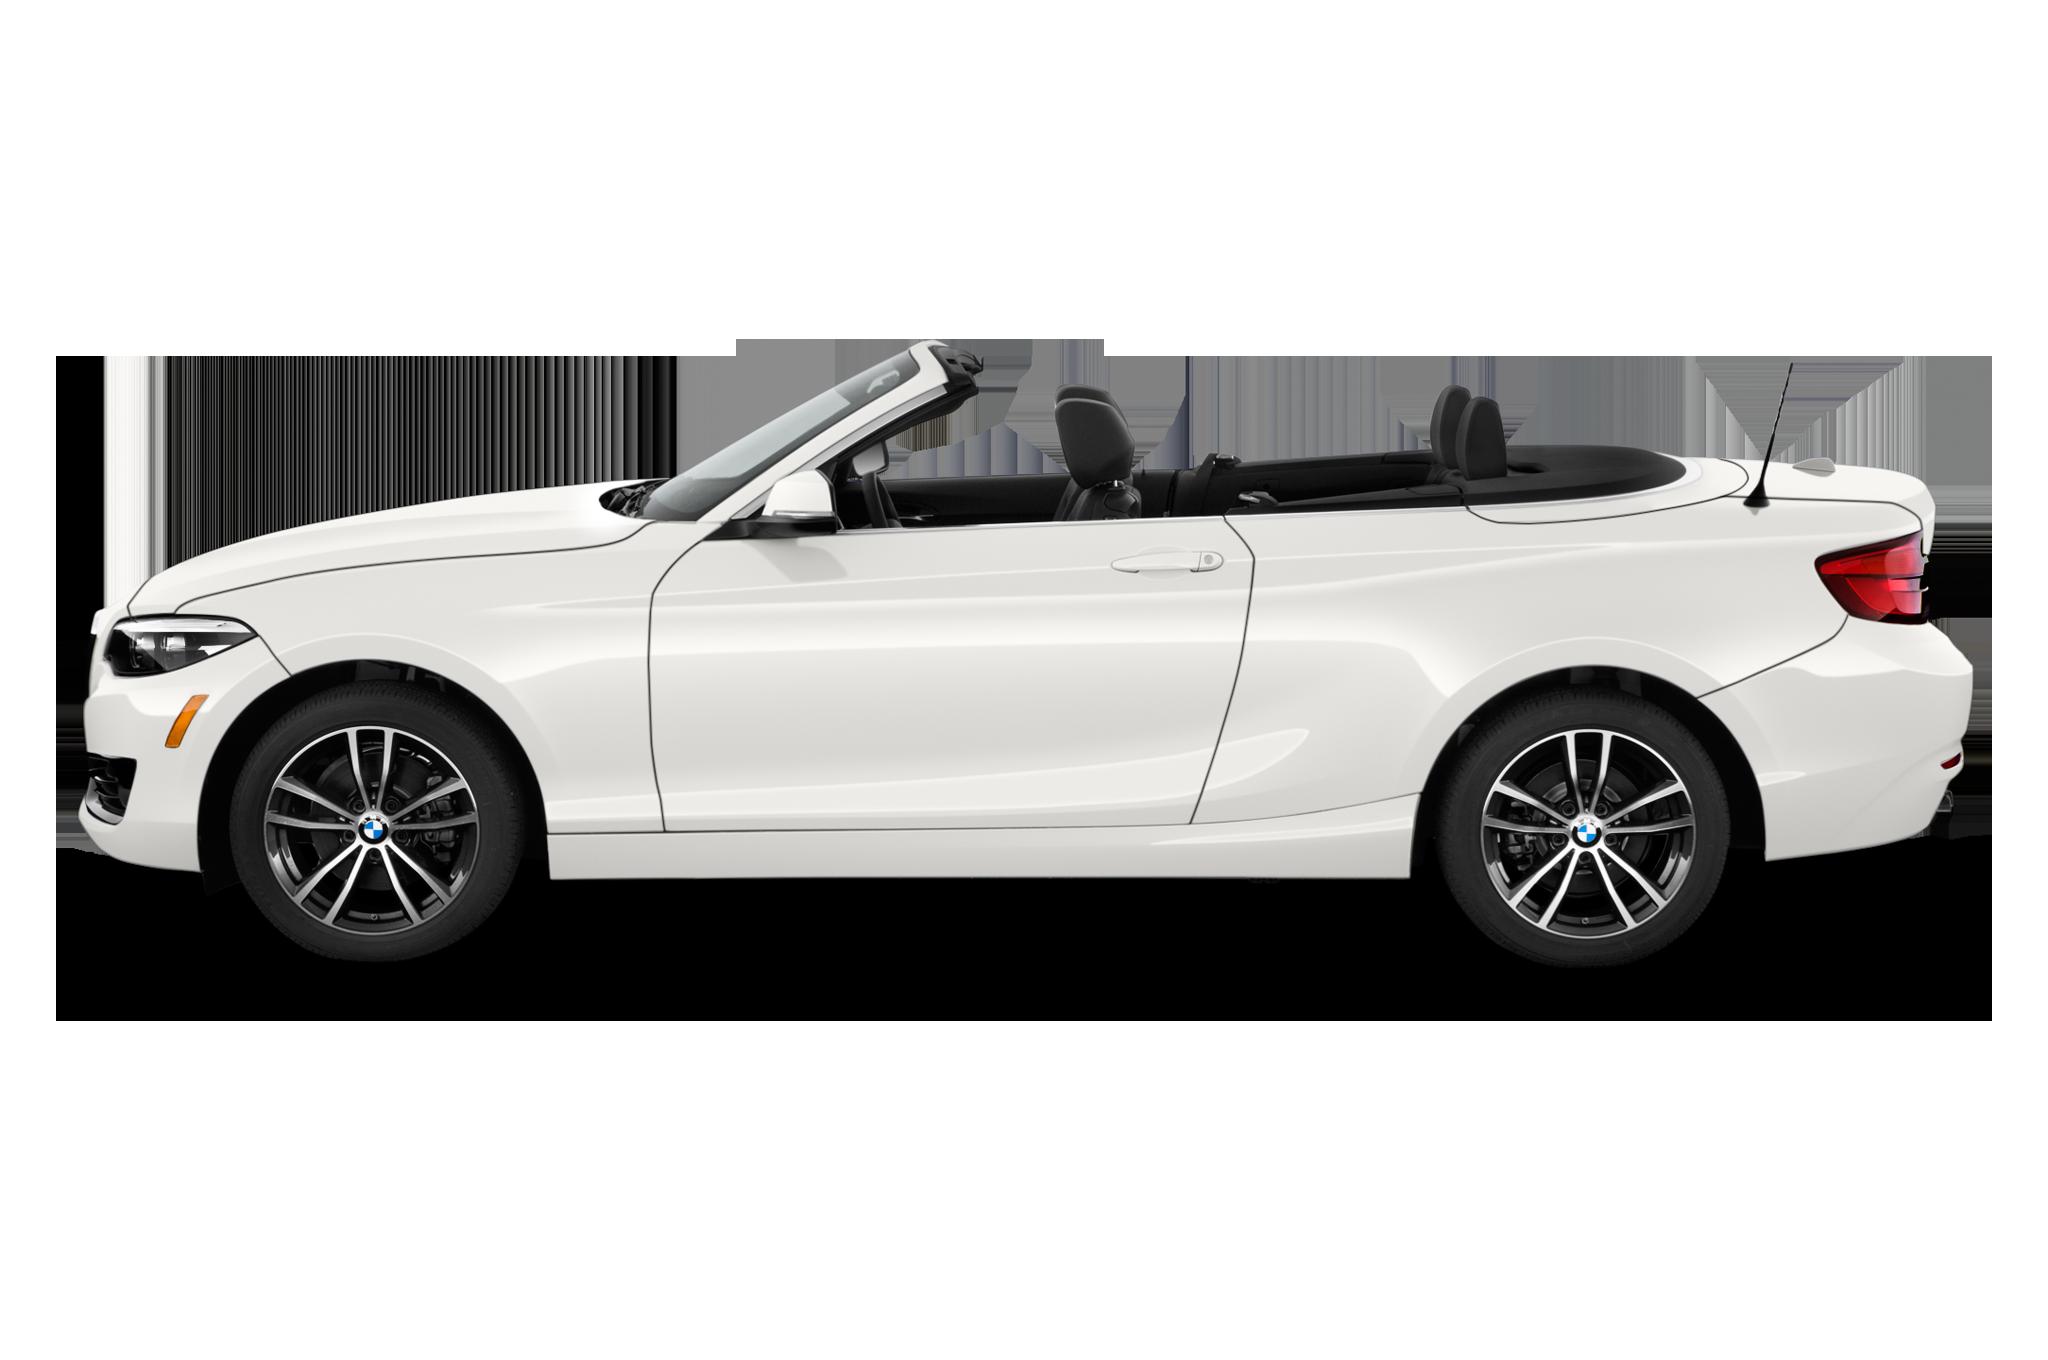 2018 bmw 2 series arrives with subtle updates automobile. Black Bedroom Furniture Sets. Home Design Ideas